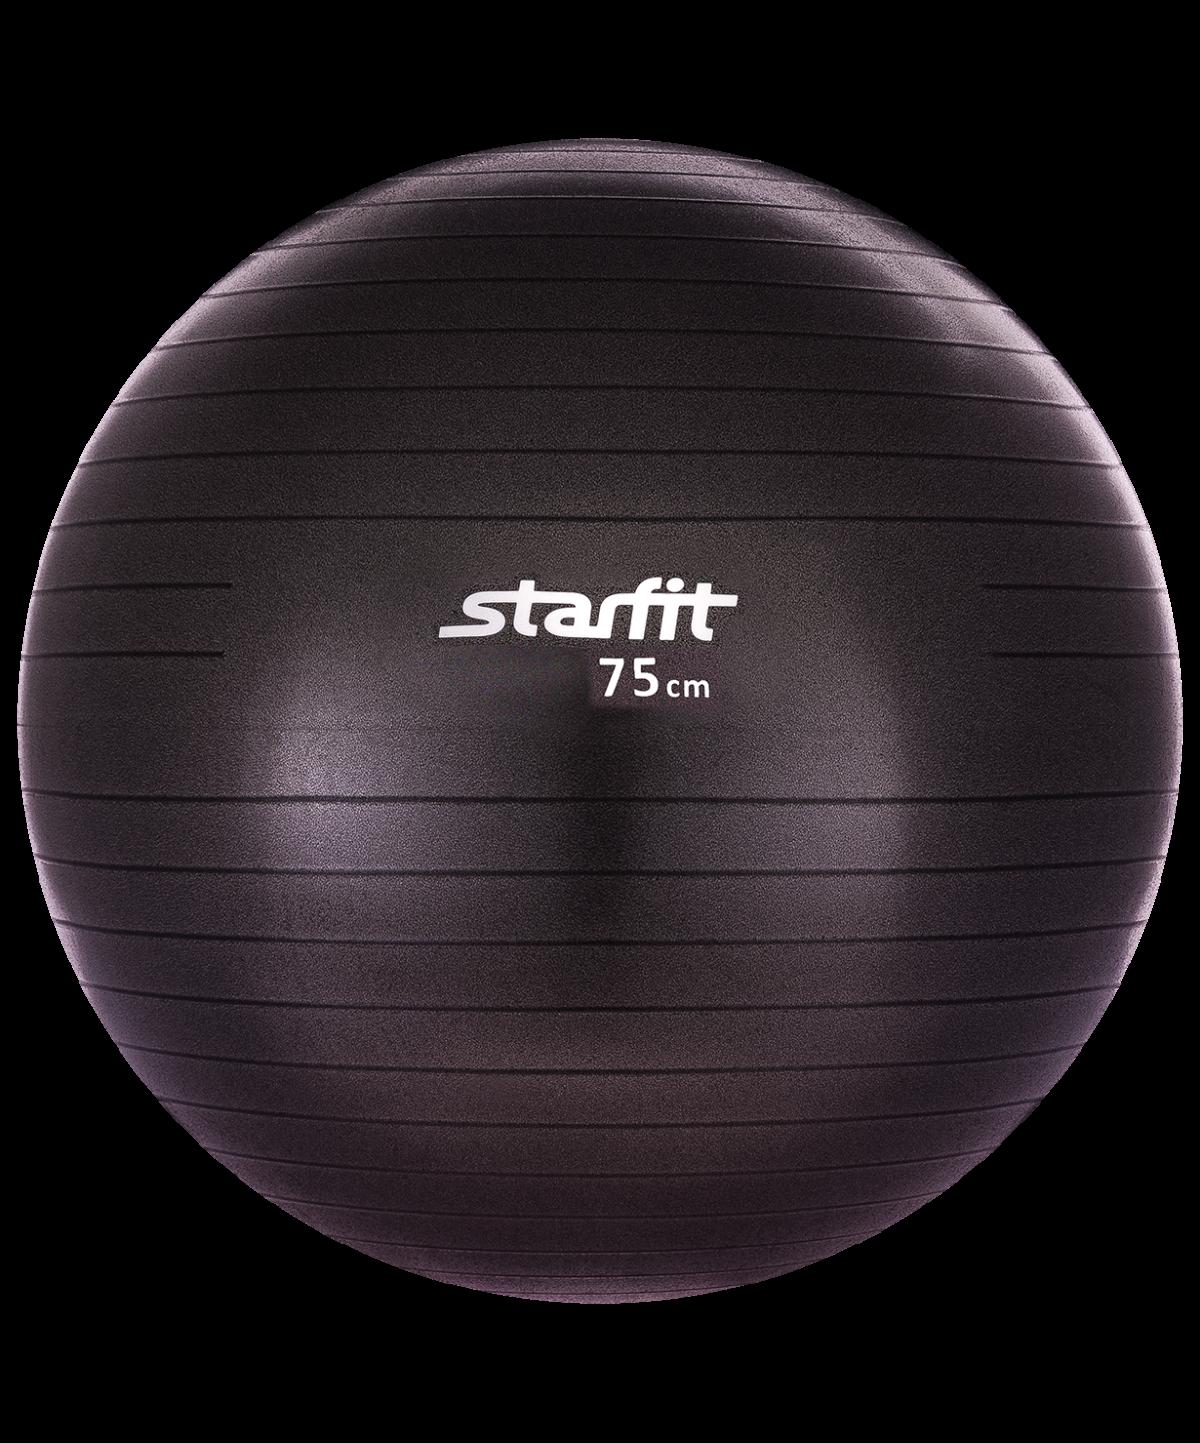 STARFIT Мяч гимнастический антивзрыв  75см GB-101 - 1